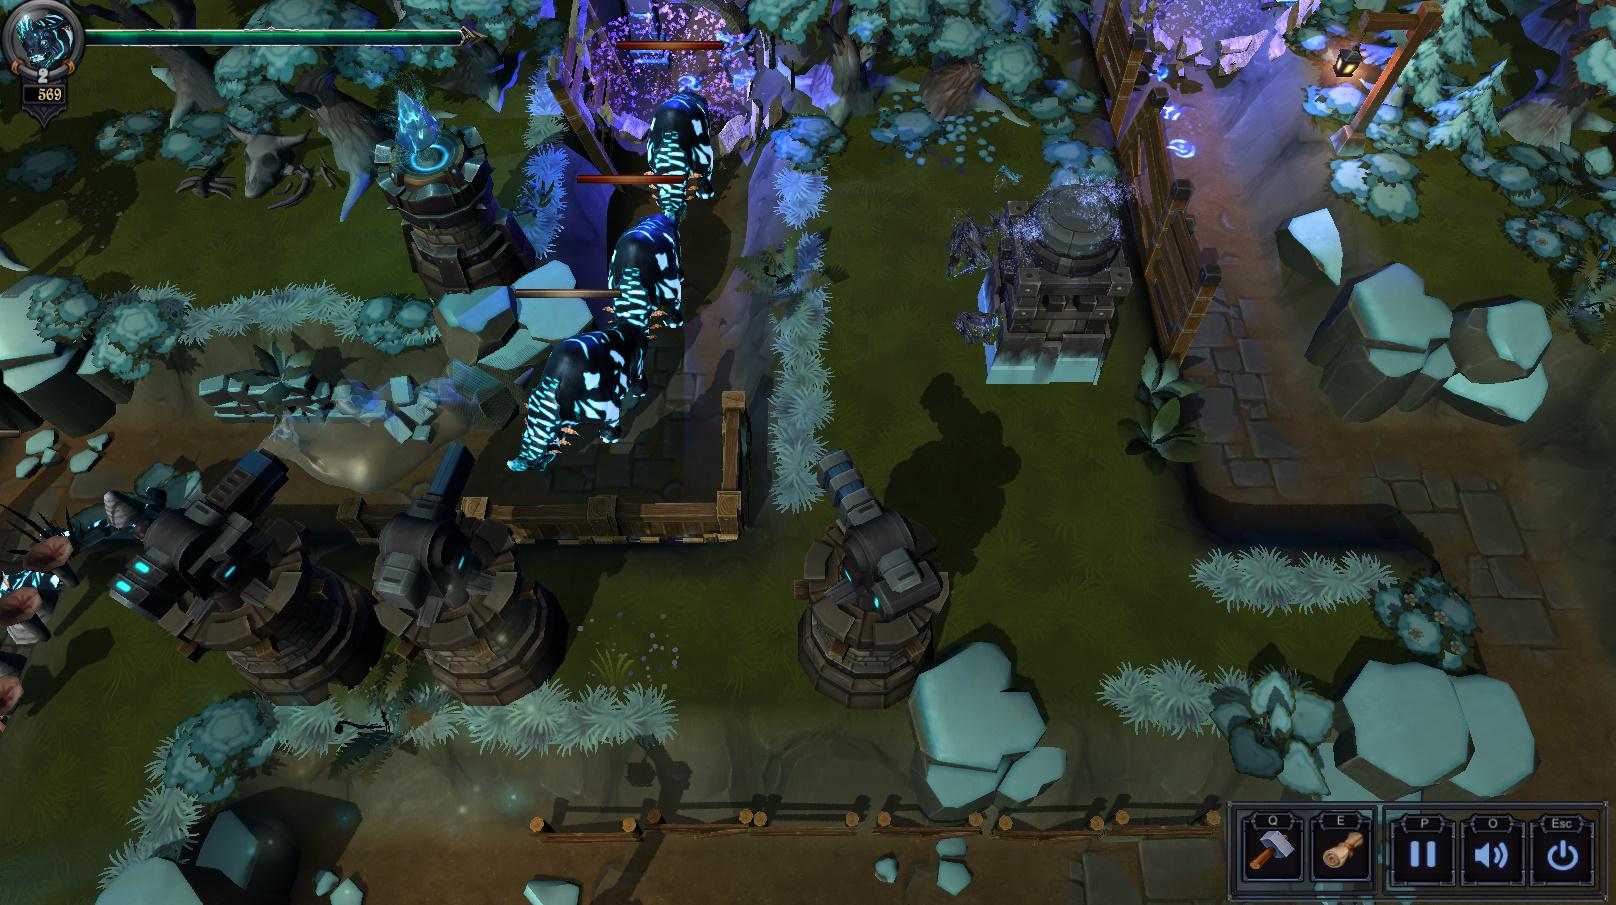 Moot District screenshot